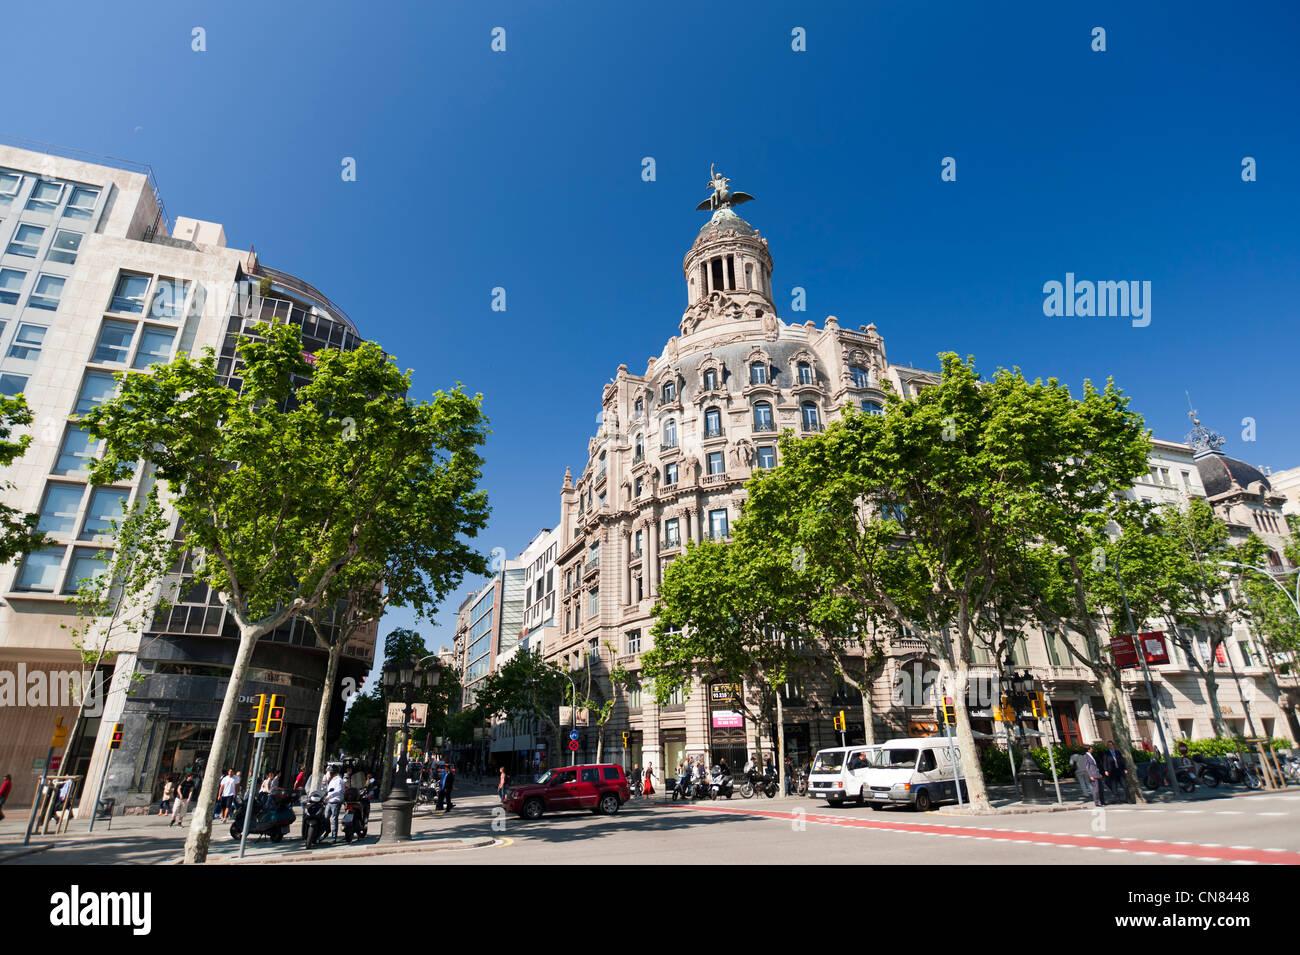 Passeig de Gracia, Barcelona, Spain. - Stock Image